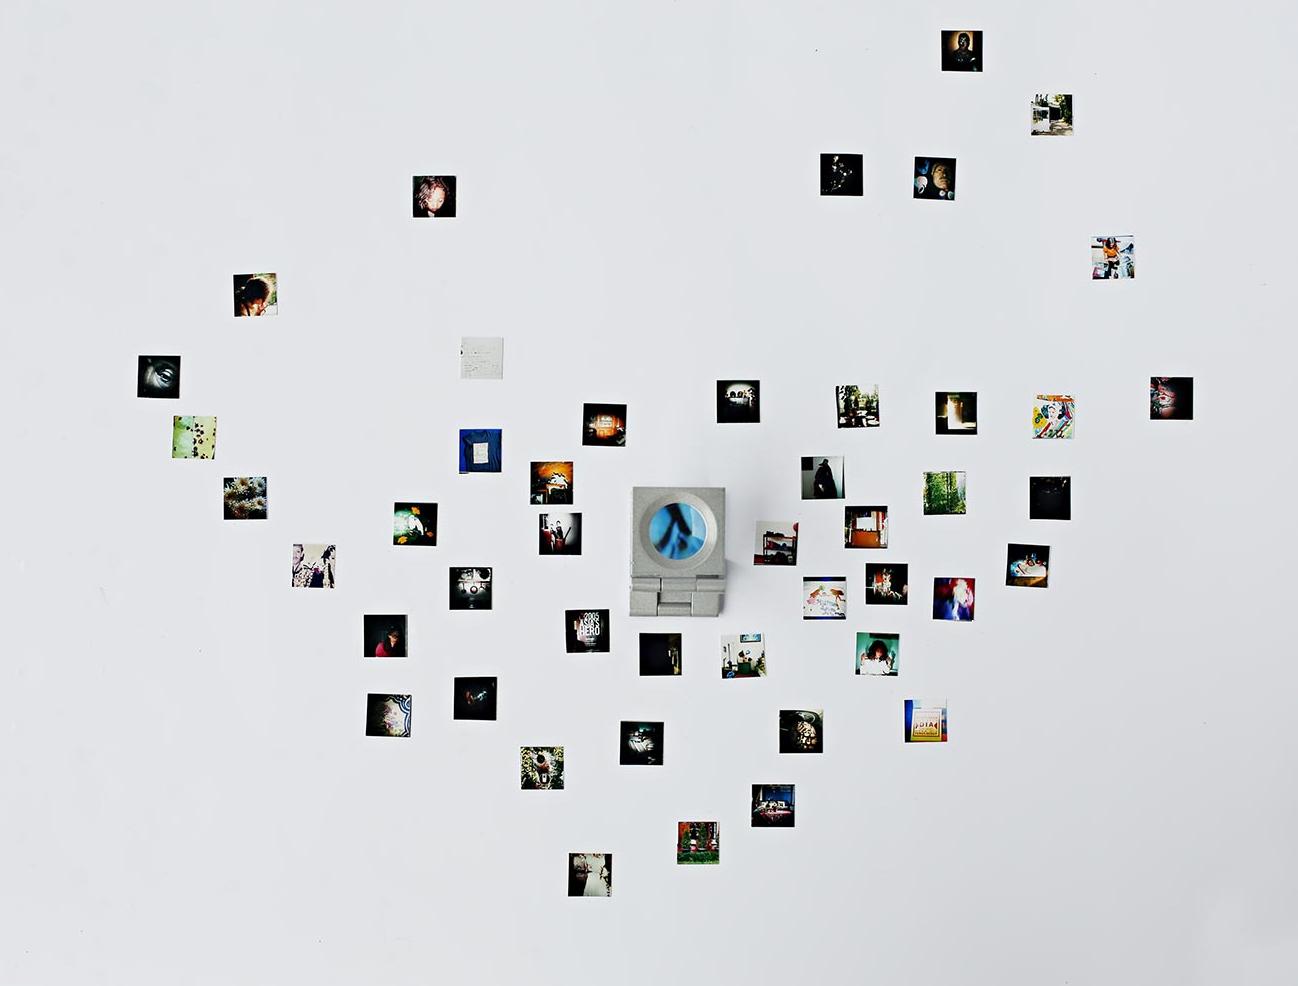 JALAN SEPI (LONELY ROAD):  47 Photographs, 1.5x1.5 cm, Loupe (magnifying glass)